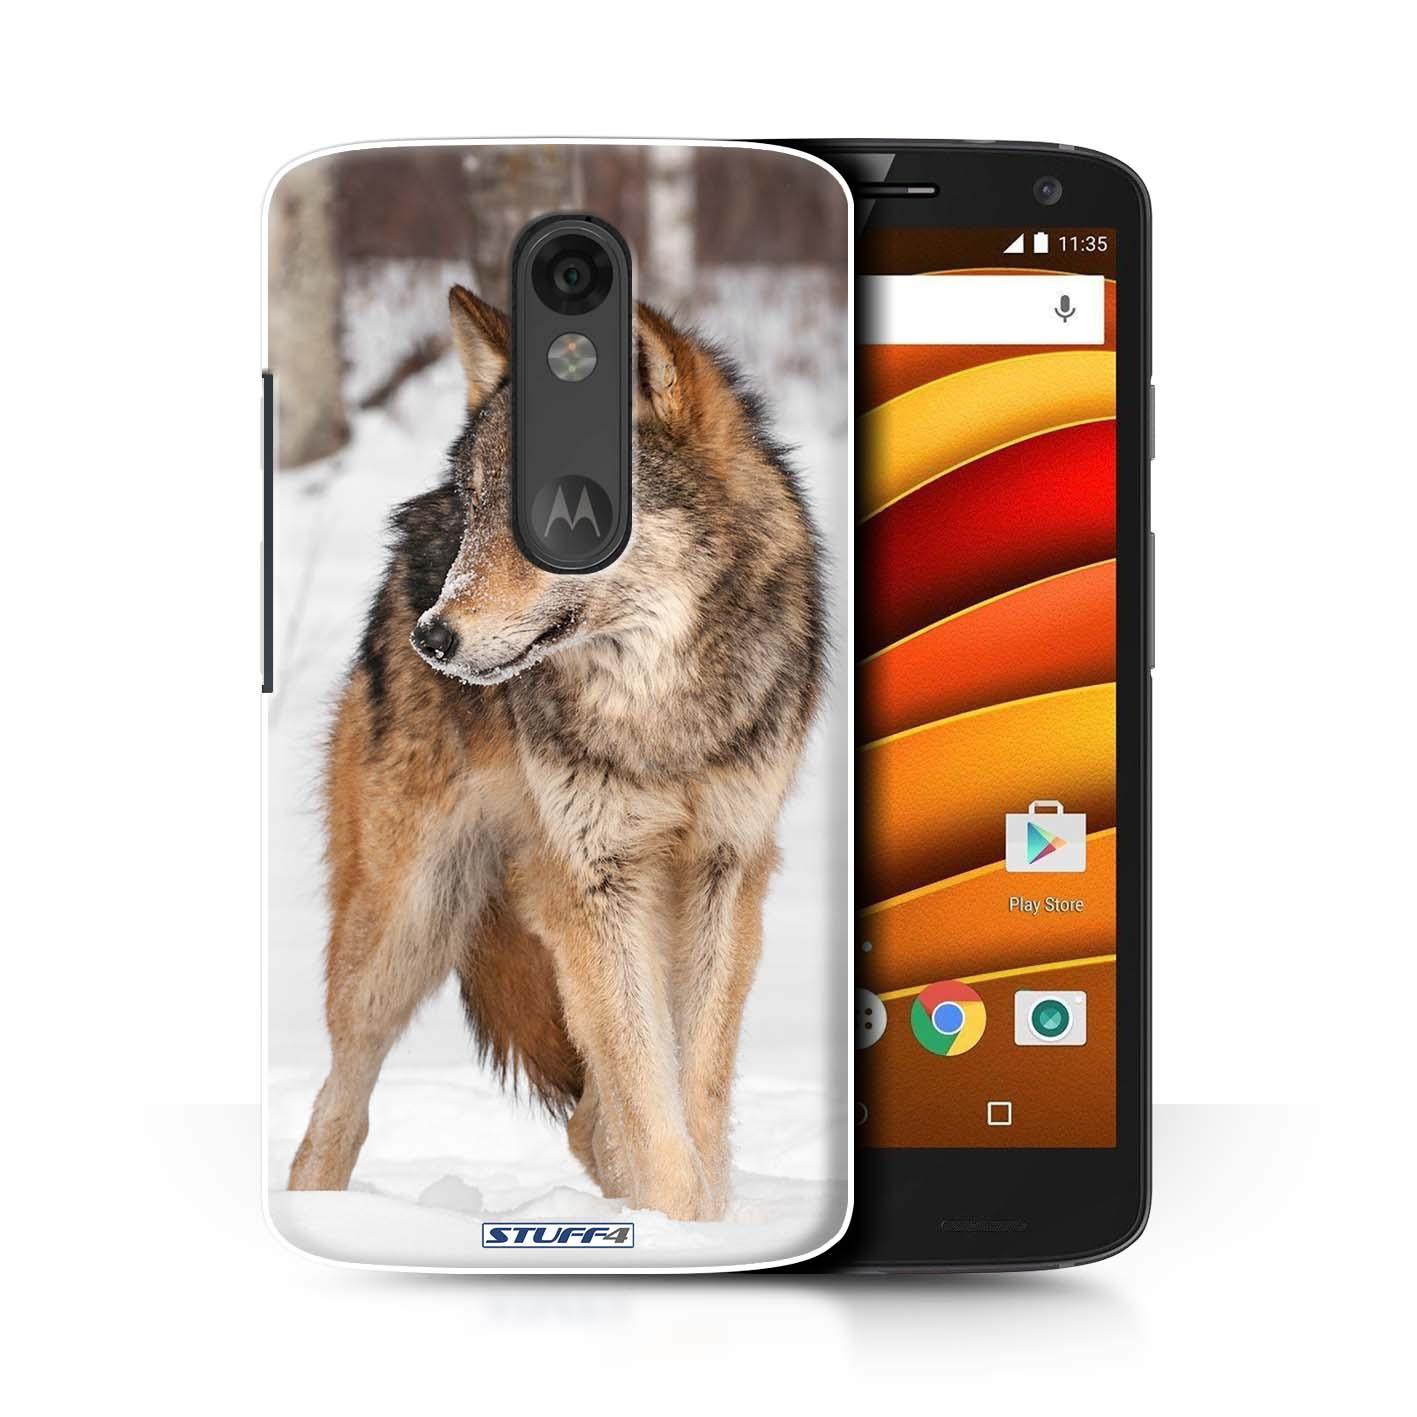 Stuff4-fundas-para-telefono-para-Motorola-E-G-Smartphone-Vida-Salvaje-Animals